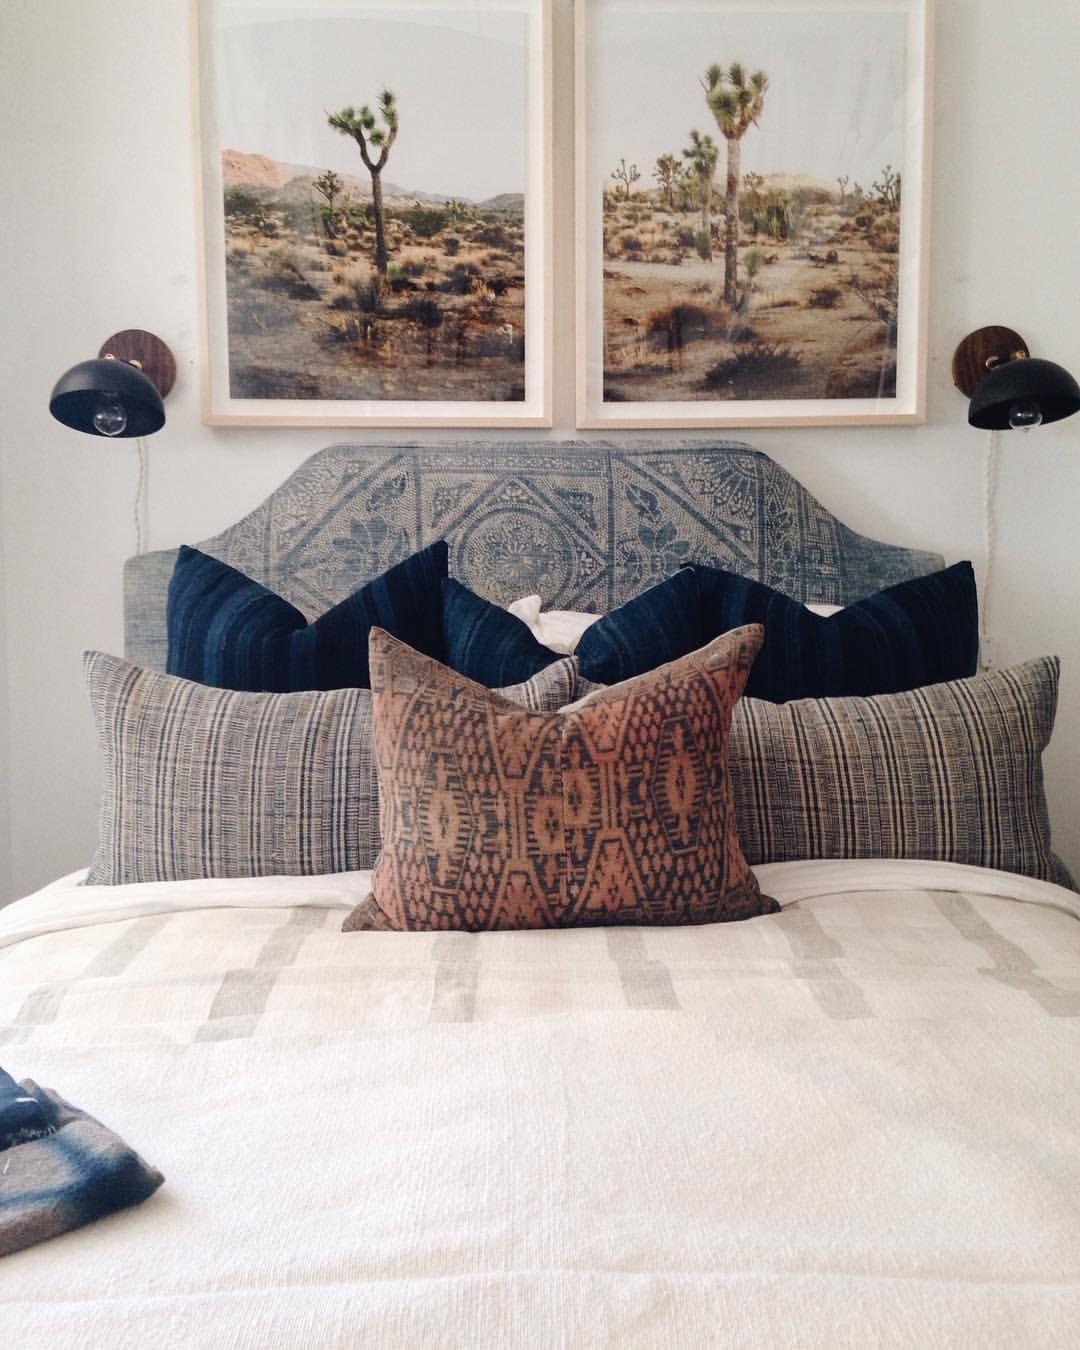 Maia Modern Bedroom Set: Pin By Maia McDonald Smith On Bedroom Dreams